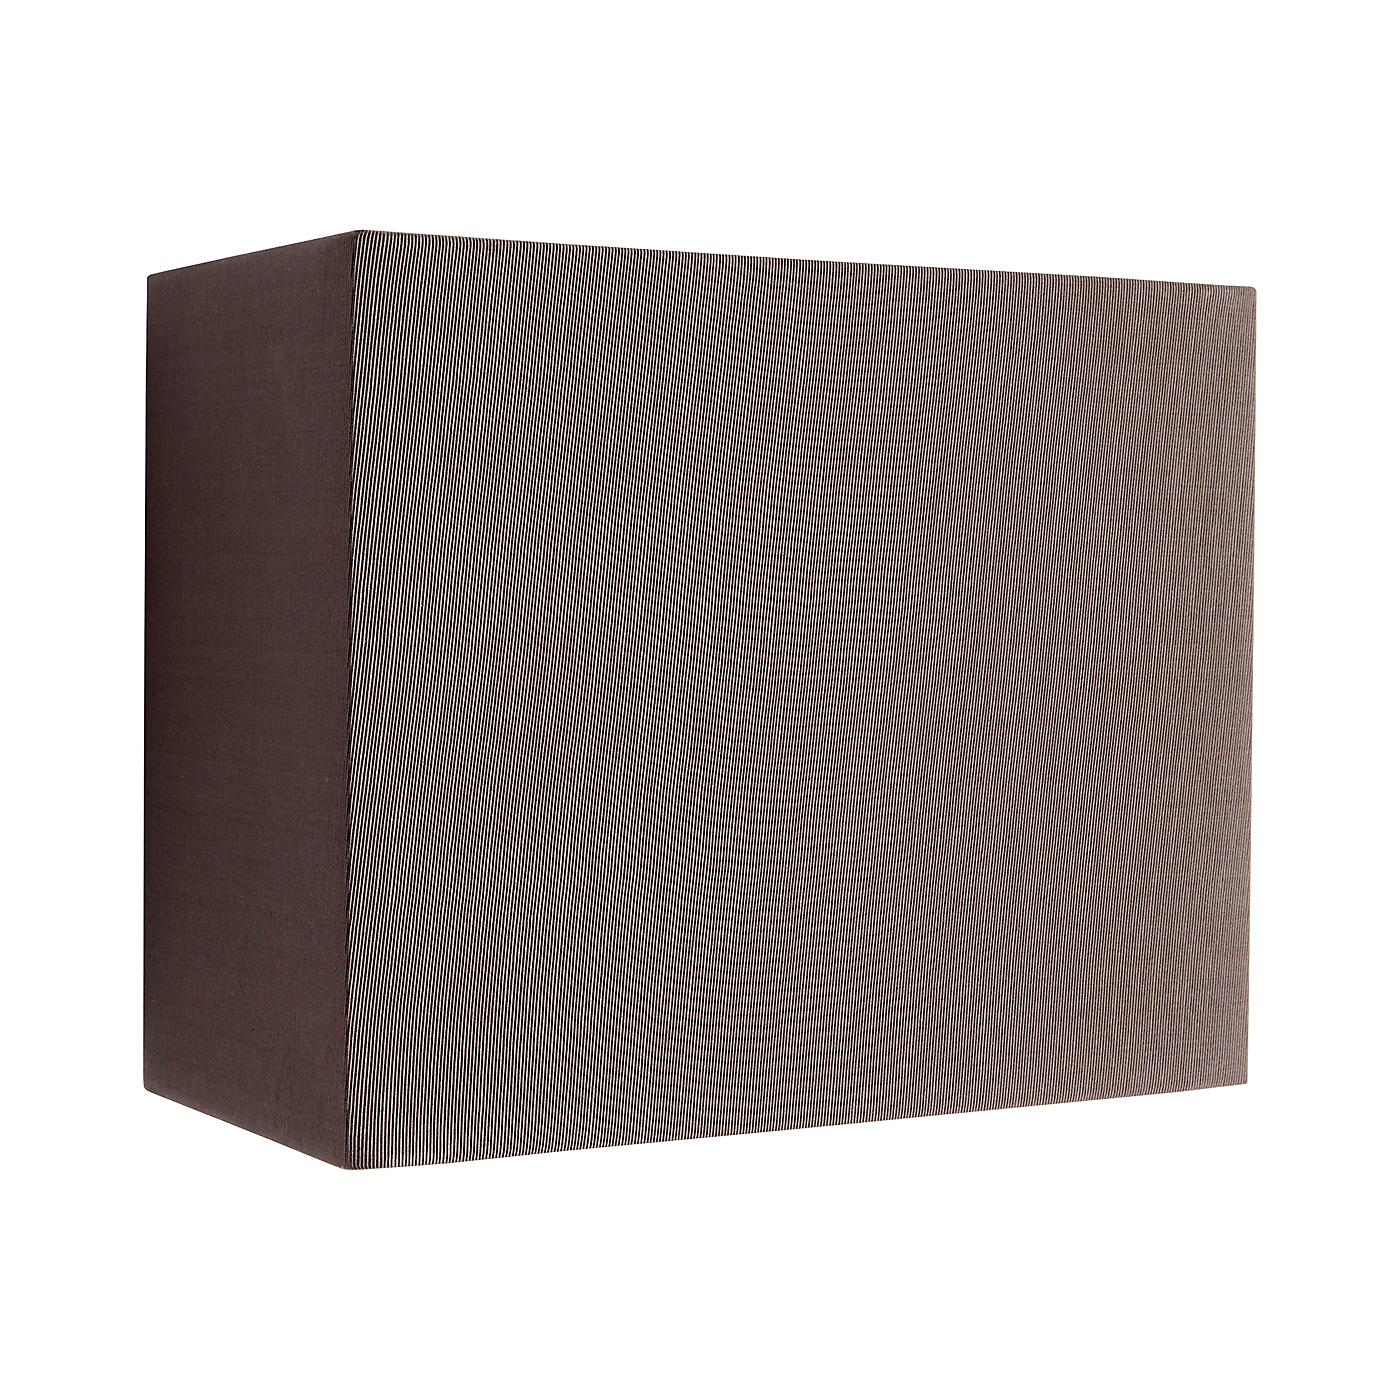 philips instyle cano wandleuchte wandleuchte kaufen bei. Black Bedroom Furniture Sets. Home Design Ideas